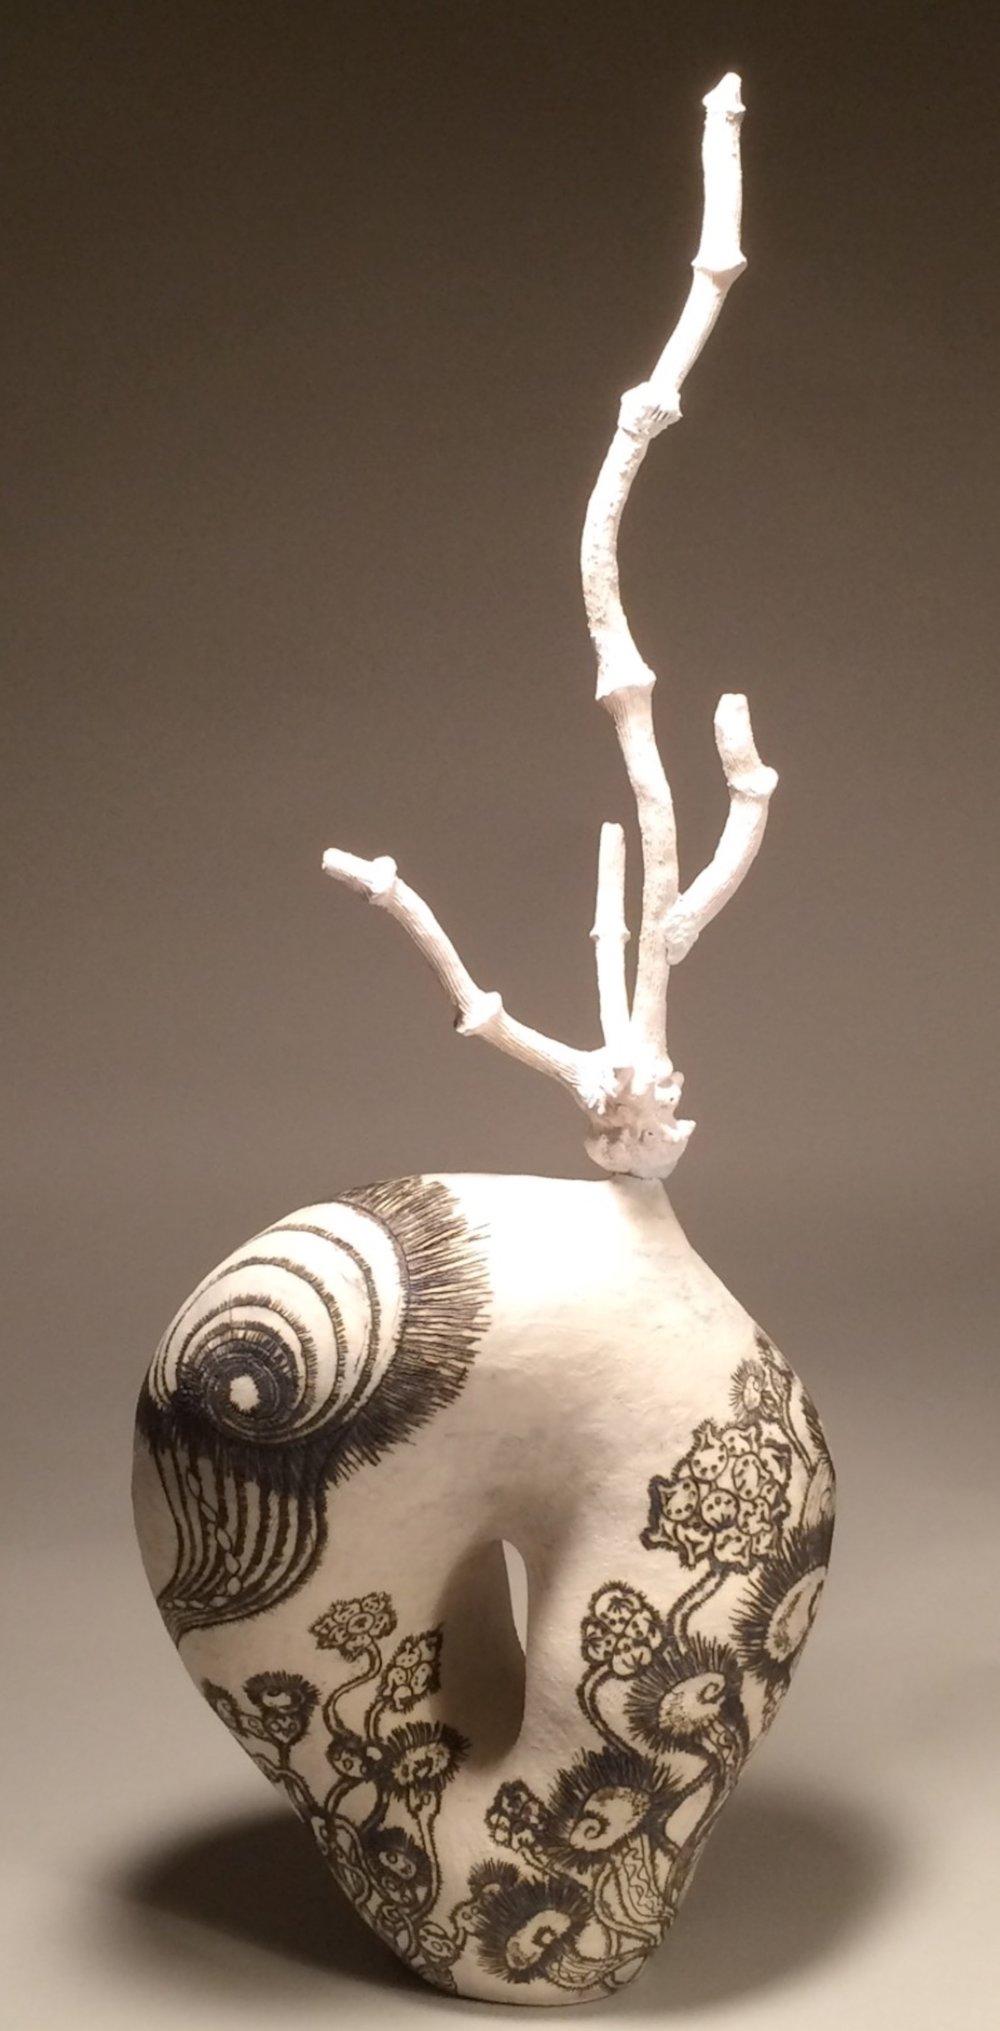 Akiko ceramic image 2.jpg